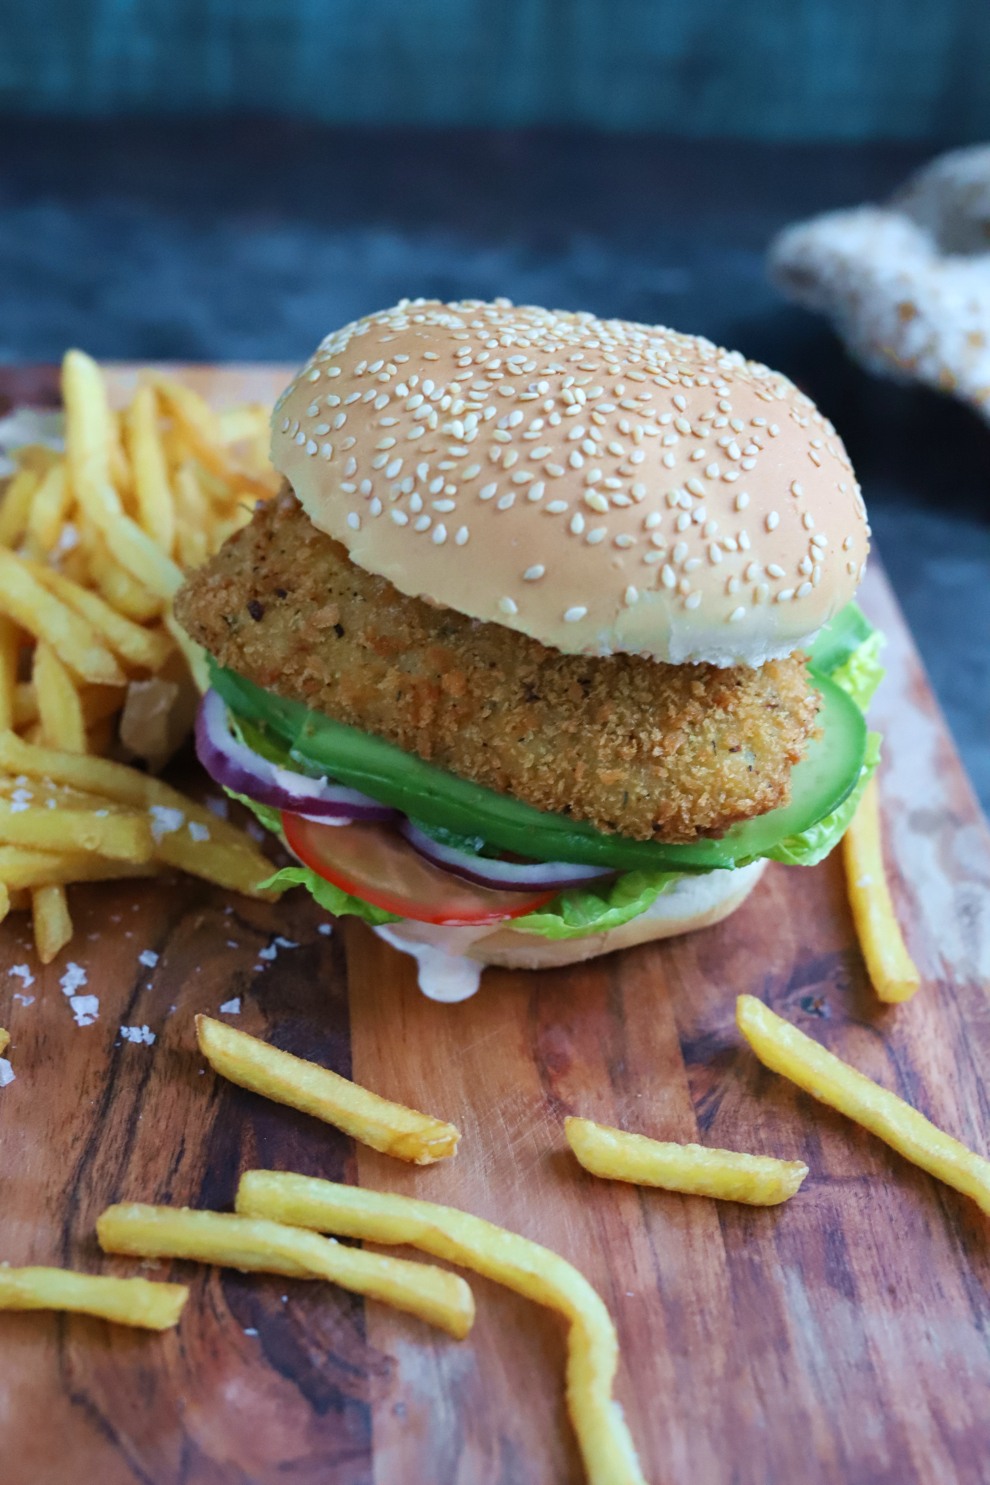 Crispy Vegan Chicken-less Burger